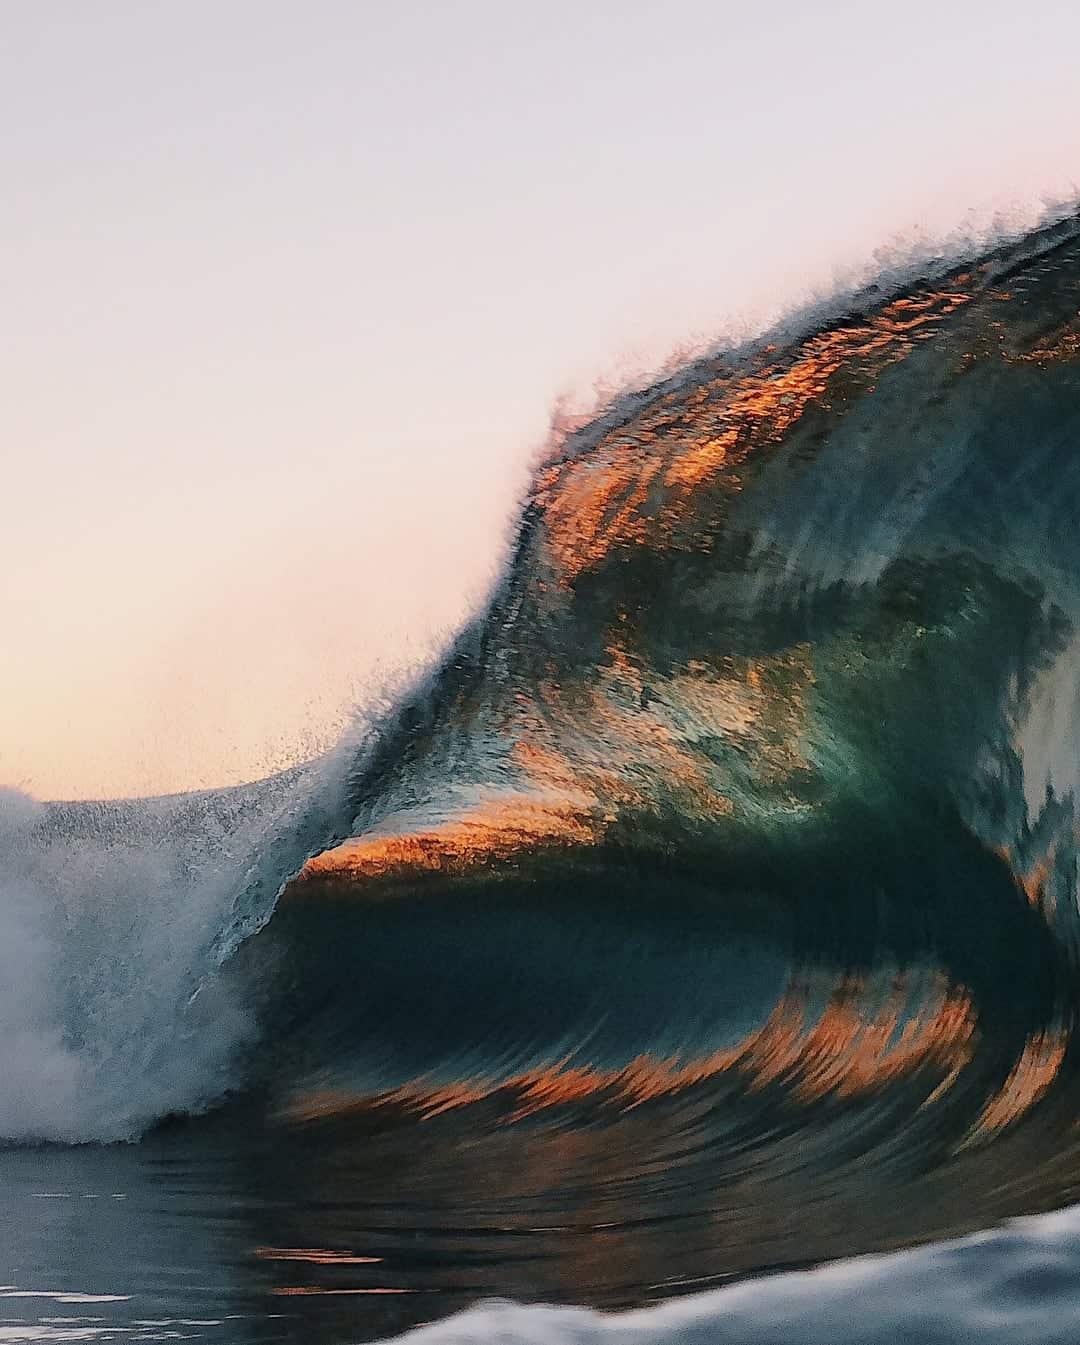 Ryan Pernofski waves 12